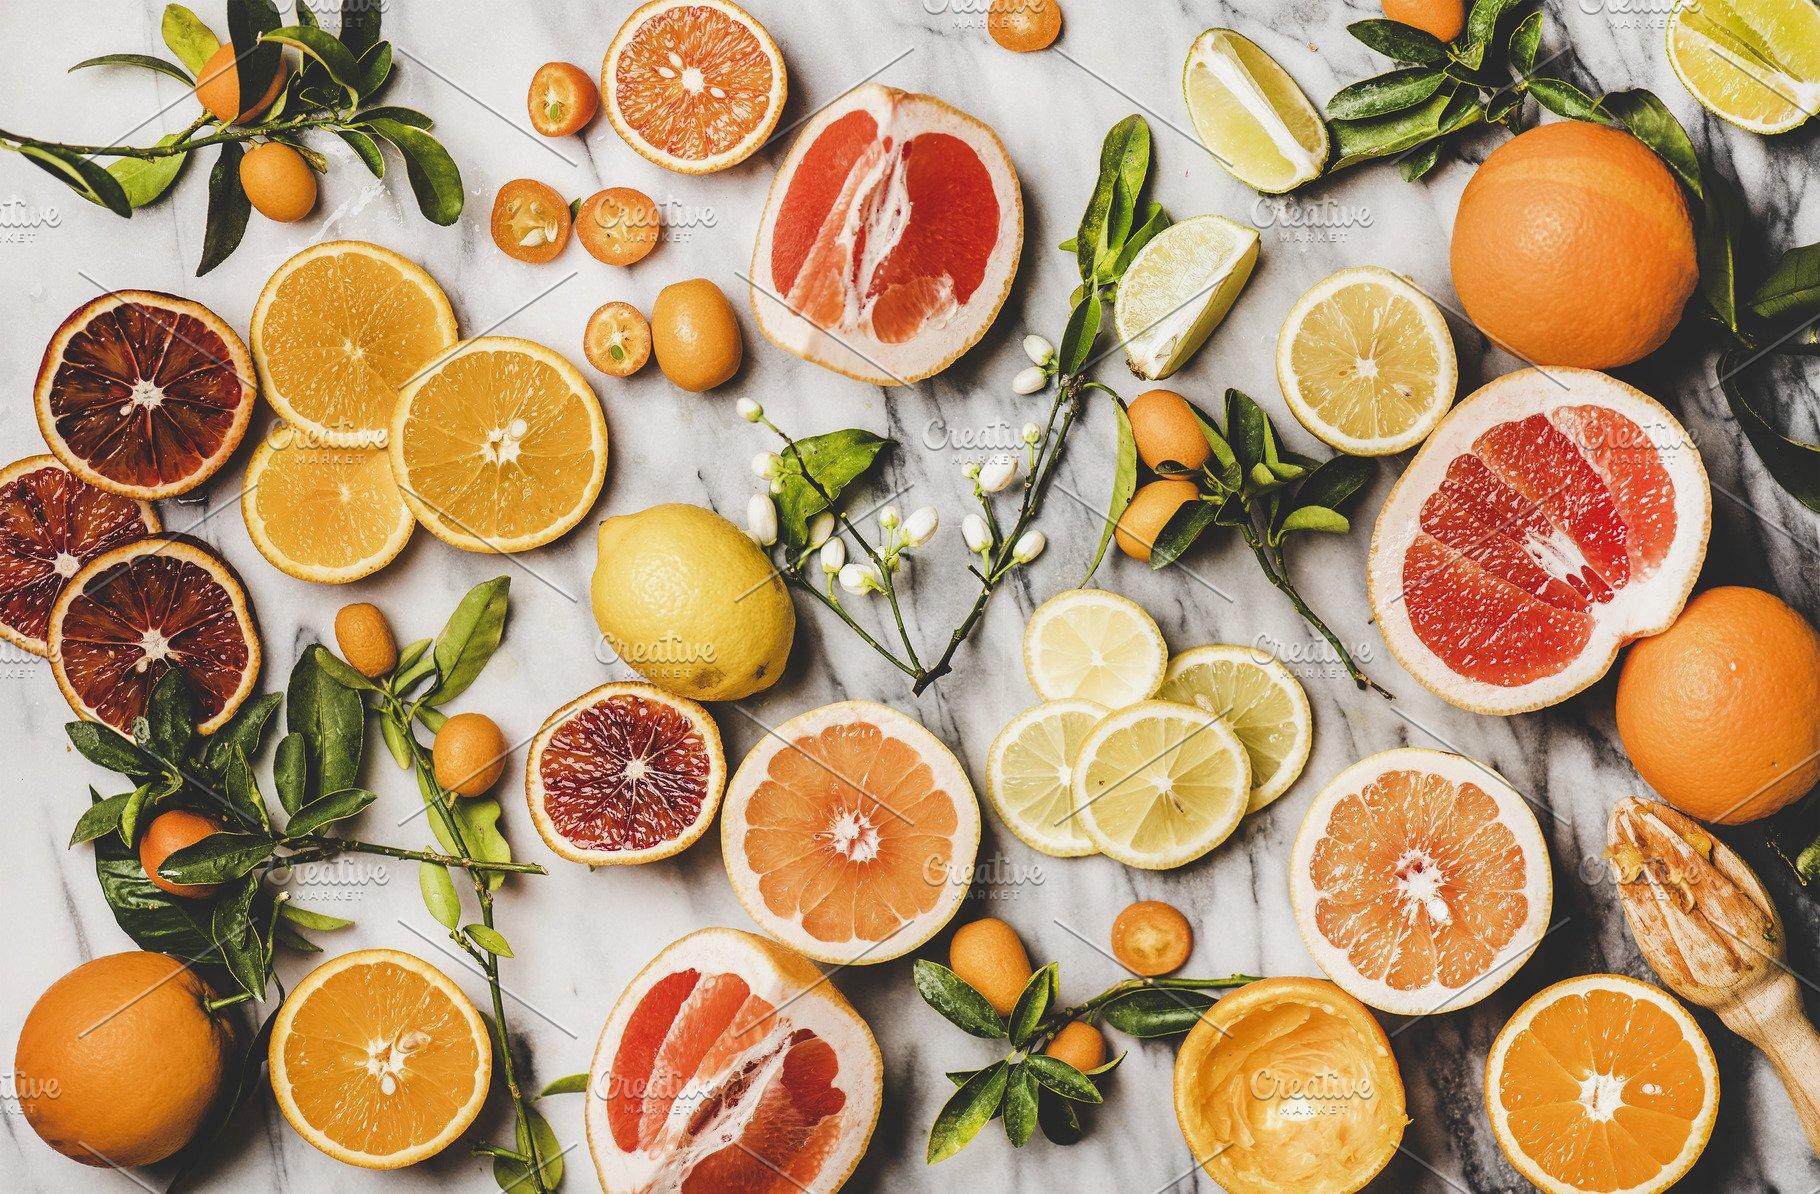 Flat-lay of fresh oranges, lemons